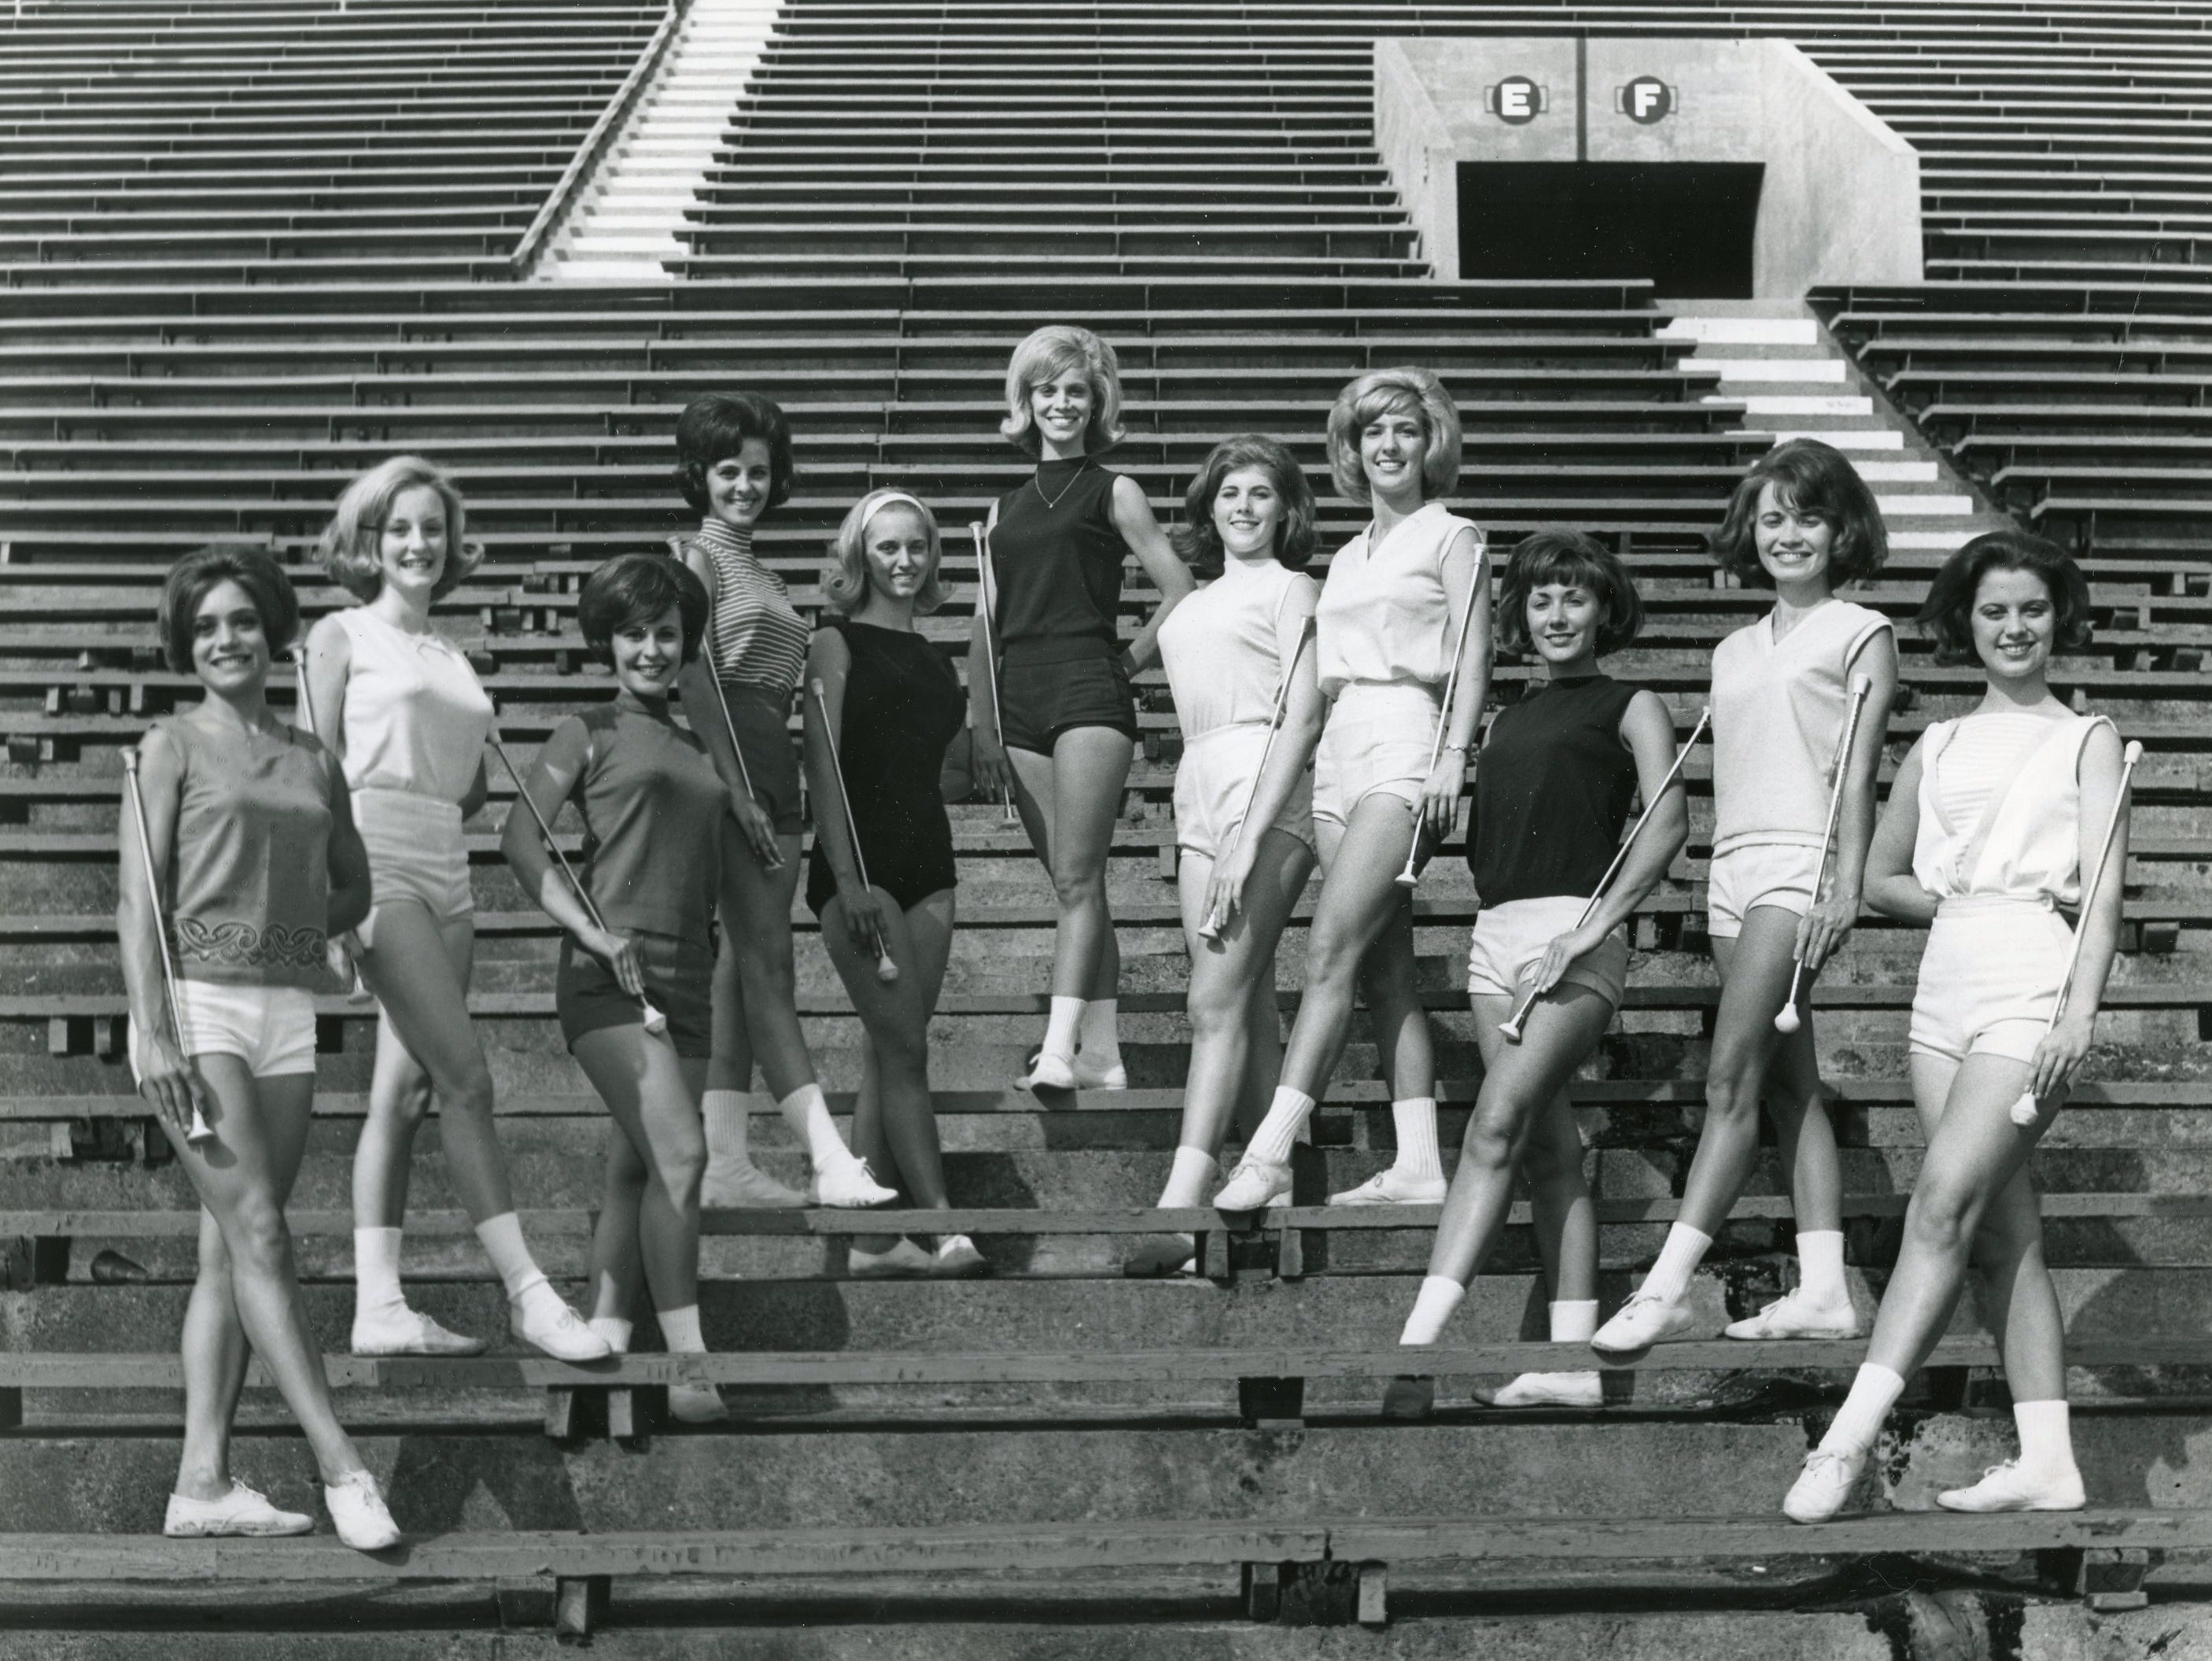 The 1965/1966 UT majorettes: Becky Nanney, Diane Fleming, Elaine White, Katherine Price, Pam Bailey, Judy Barton, Betty Lou Simpson, Brenda Flowers, Valerie Foster, Mary Kay Bettis and Judy Phillips.